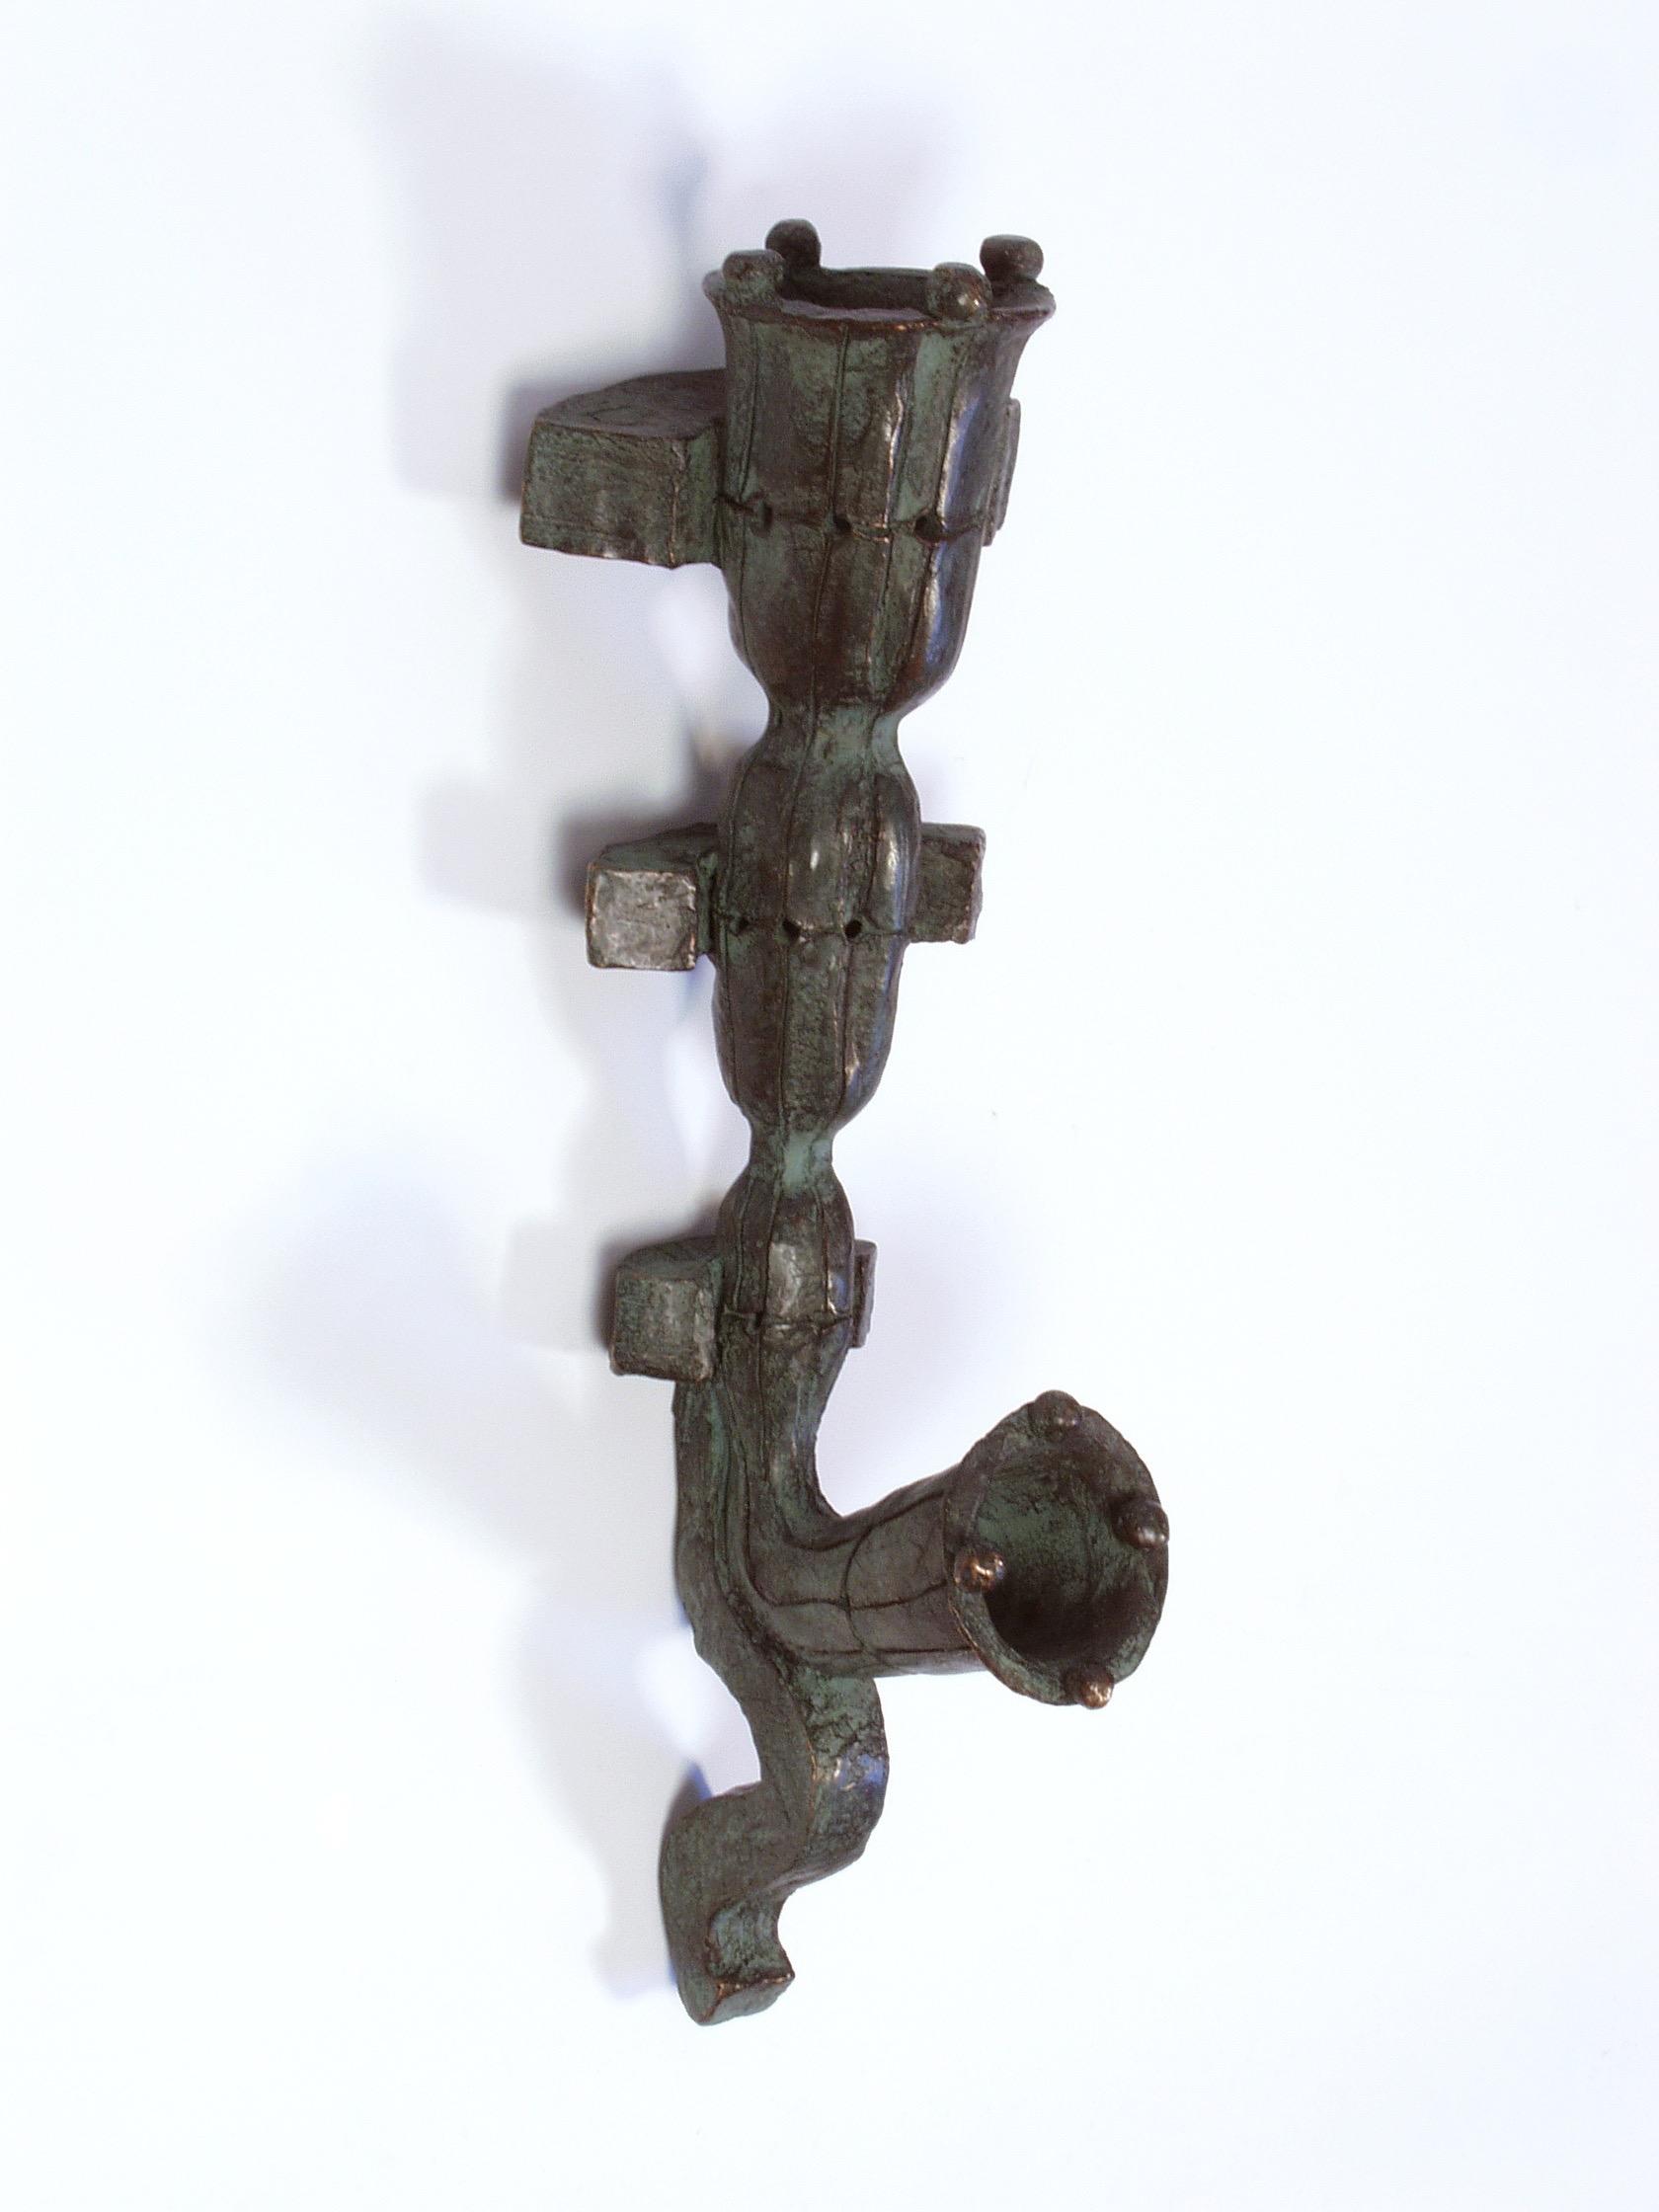 Pan, bronze (edition of 6), 49 X 16 X 18 cm, 2004